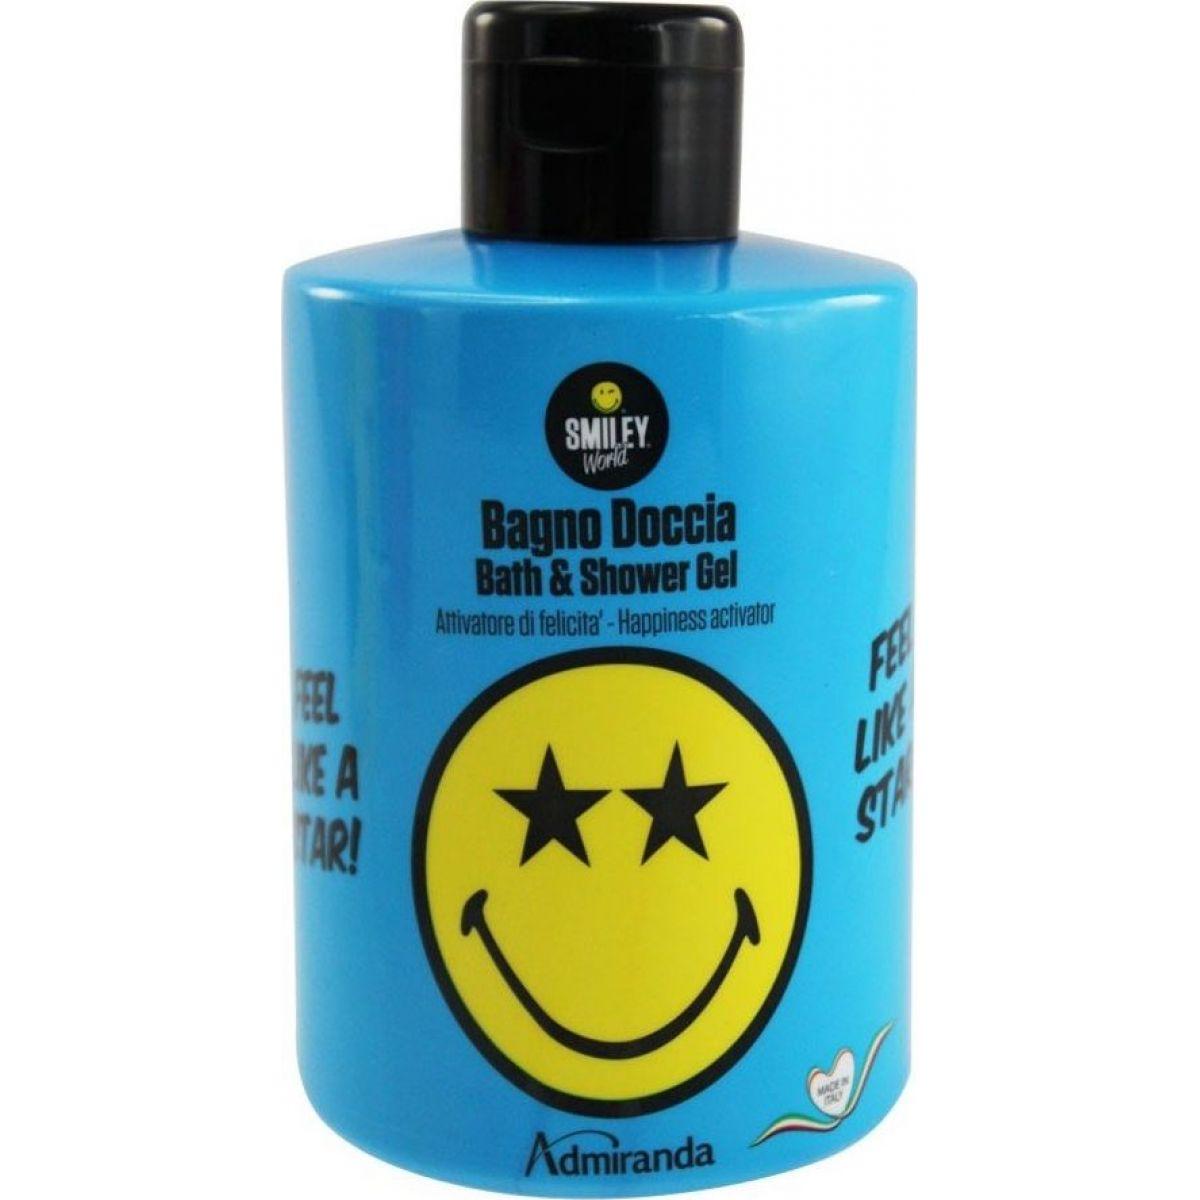 Sprchový gel 300ml Smiley 79102 - Poškozený obal